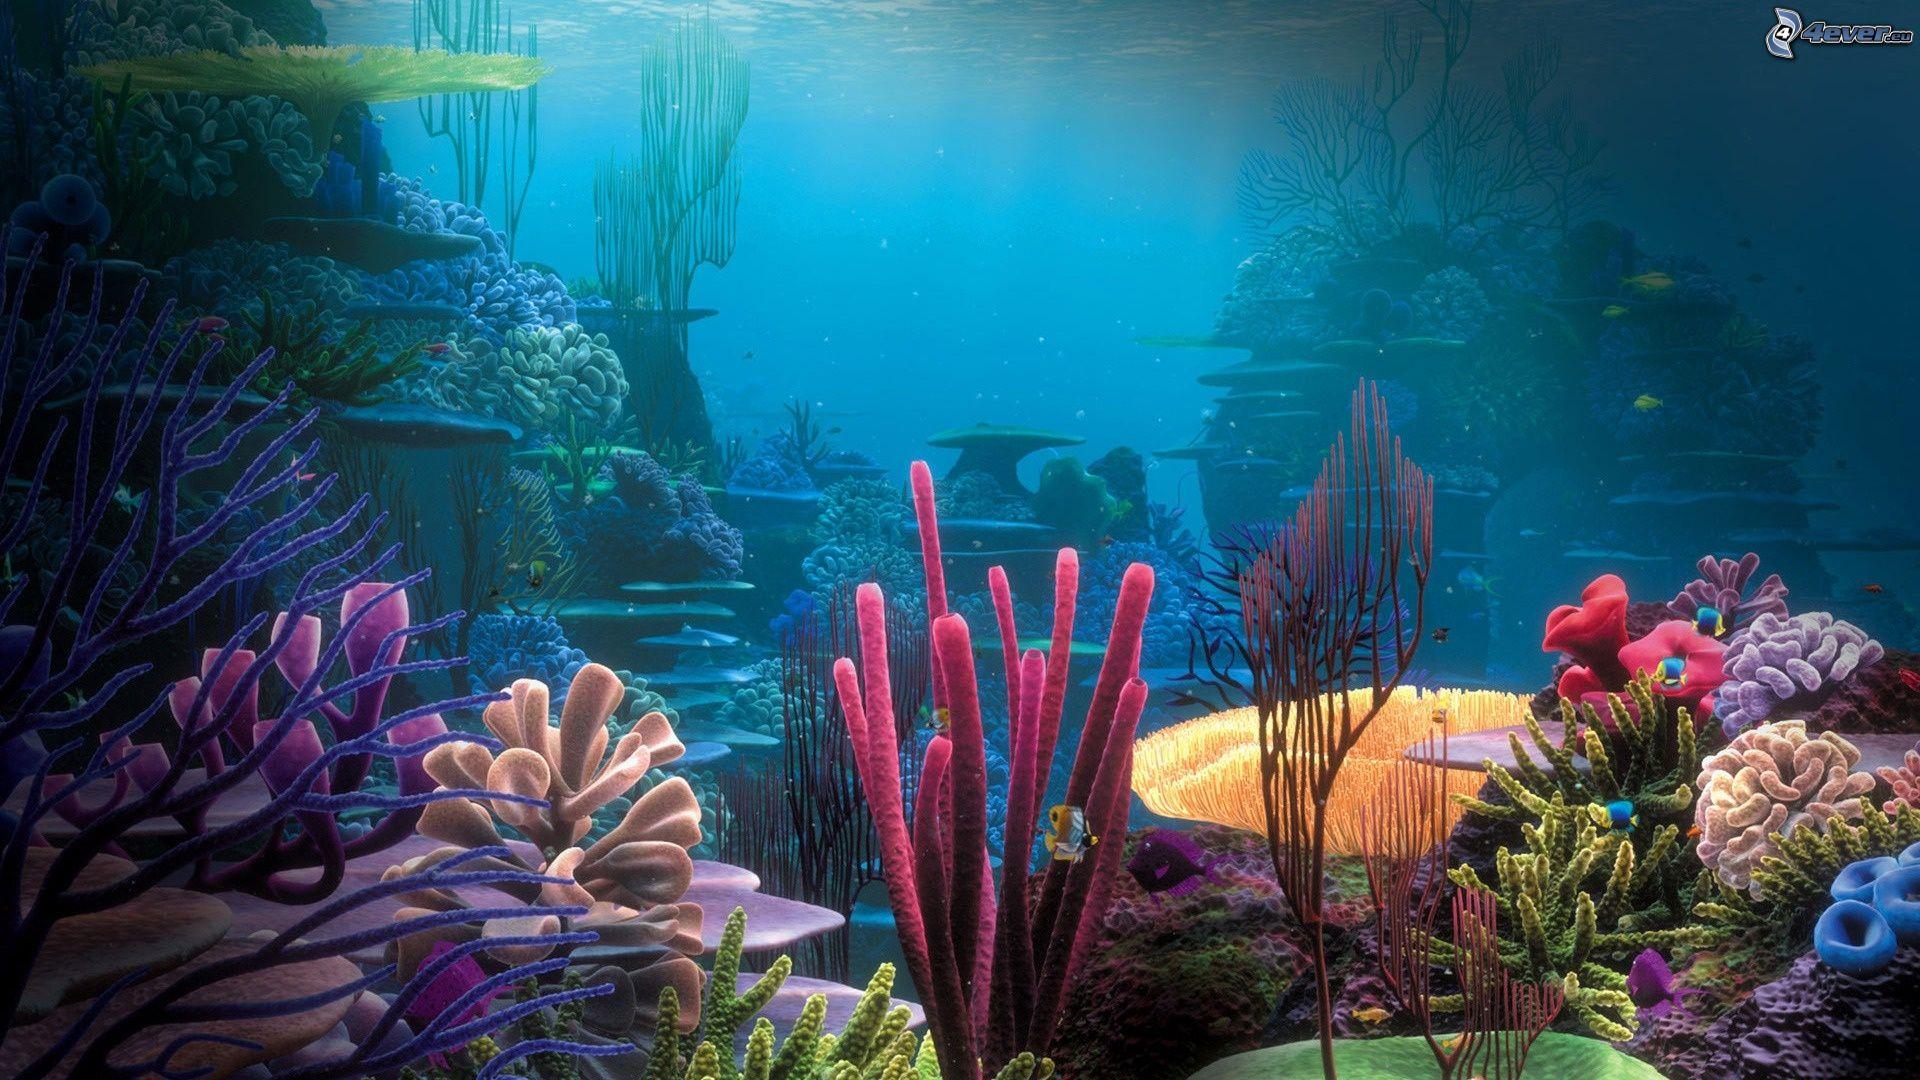 Fondo del mar - Fotos fondo del mar ...